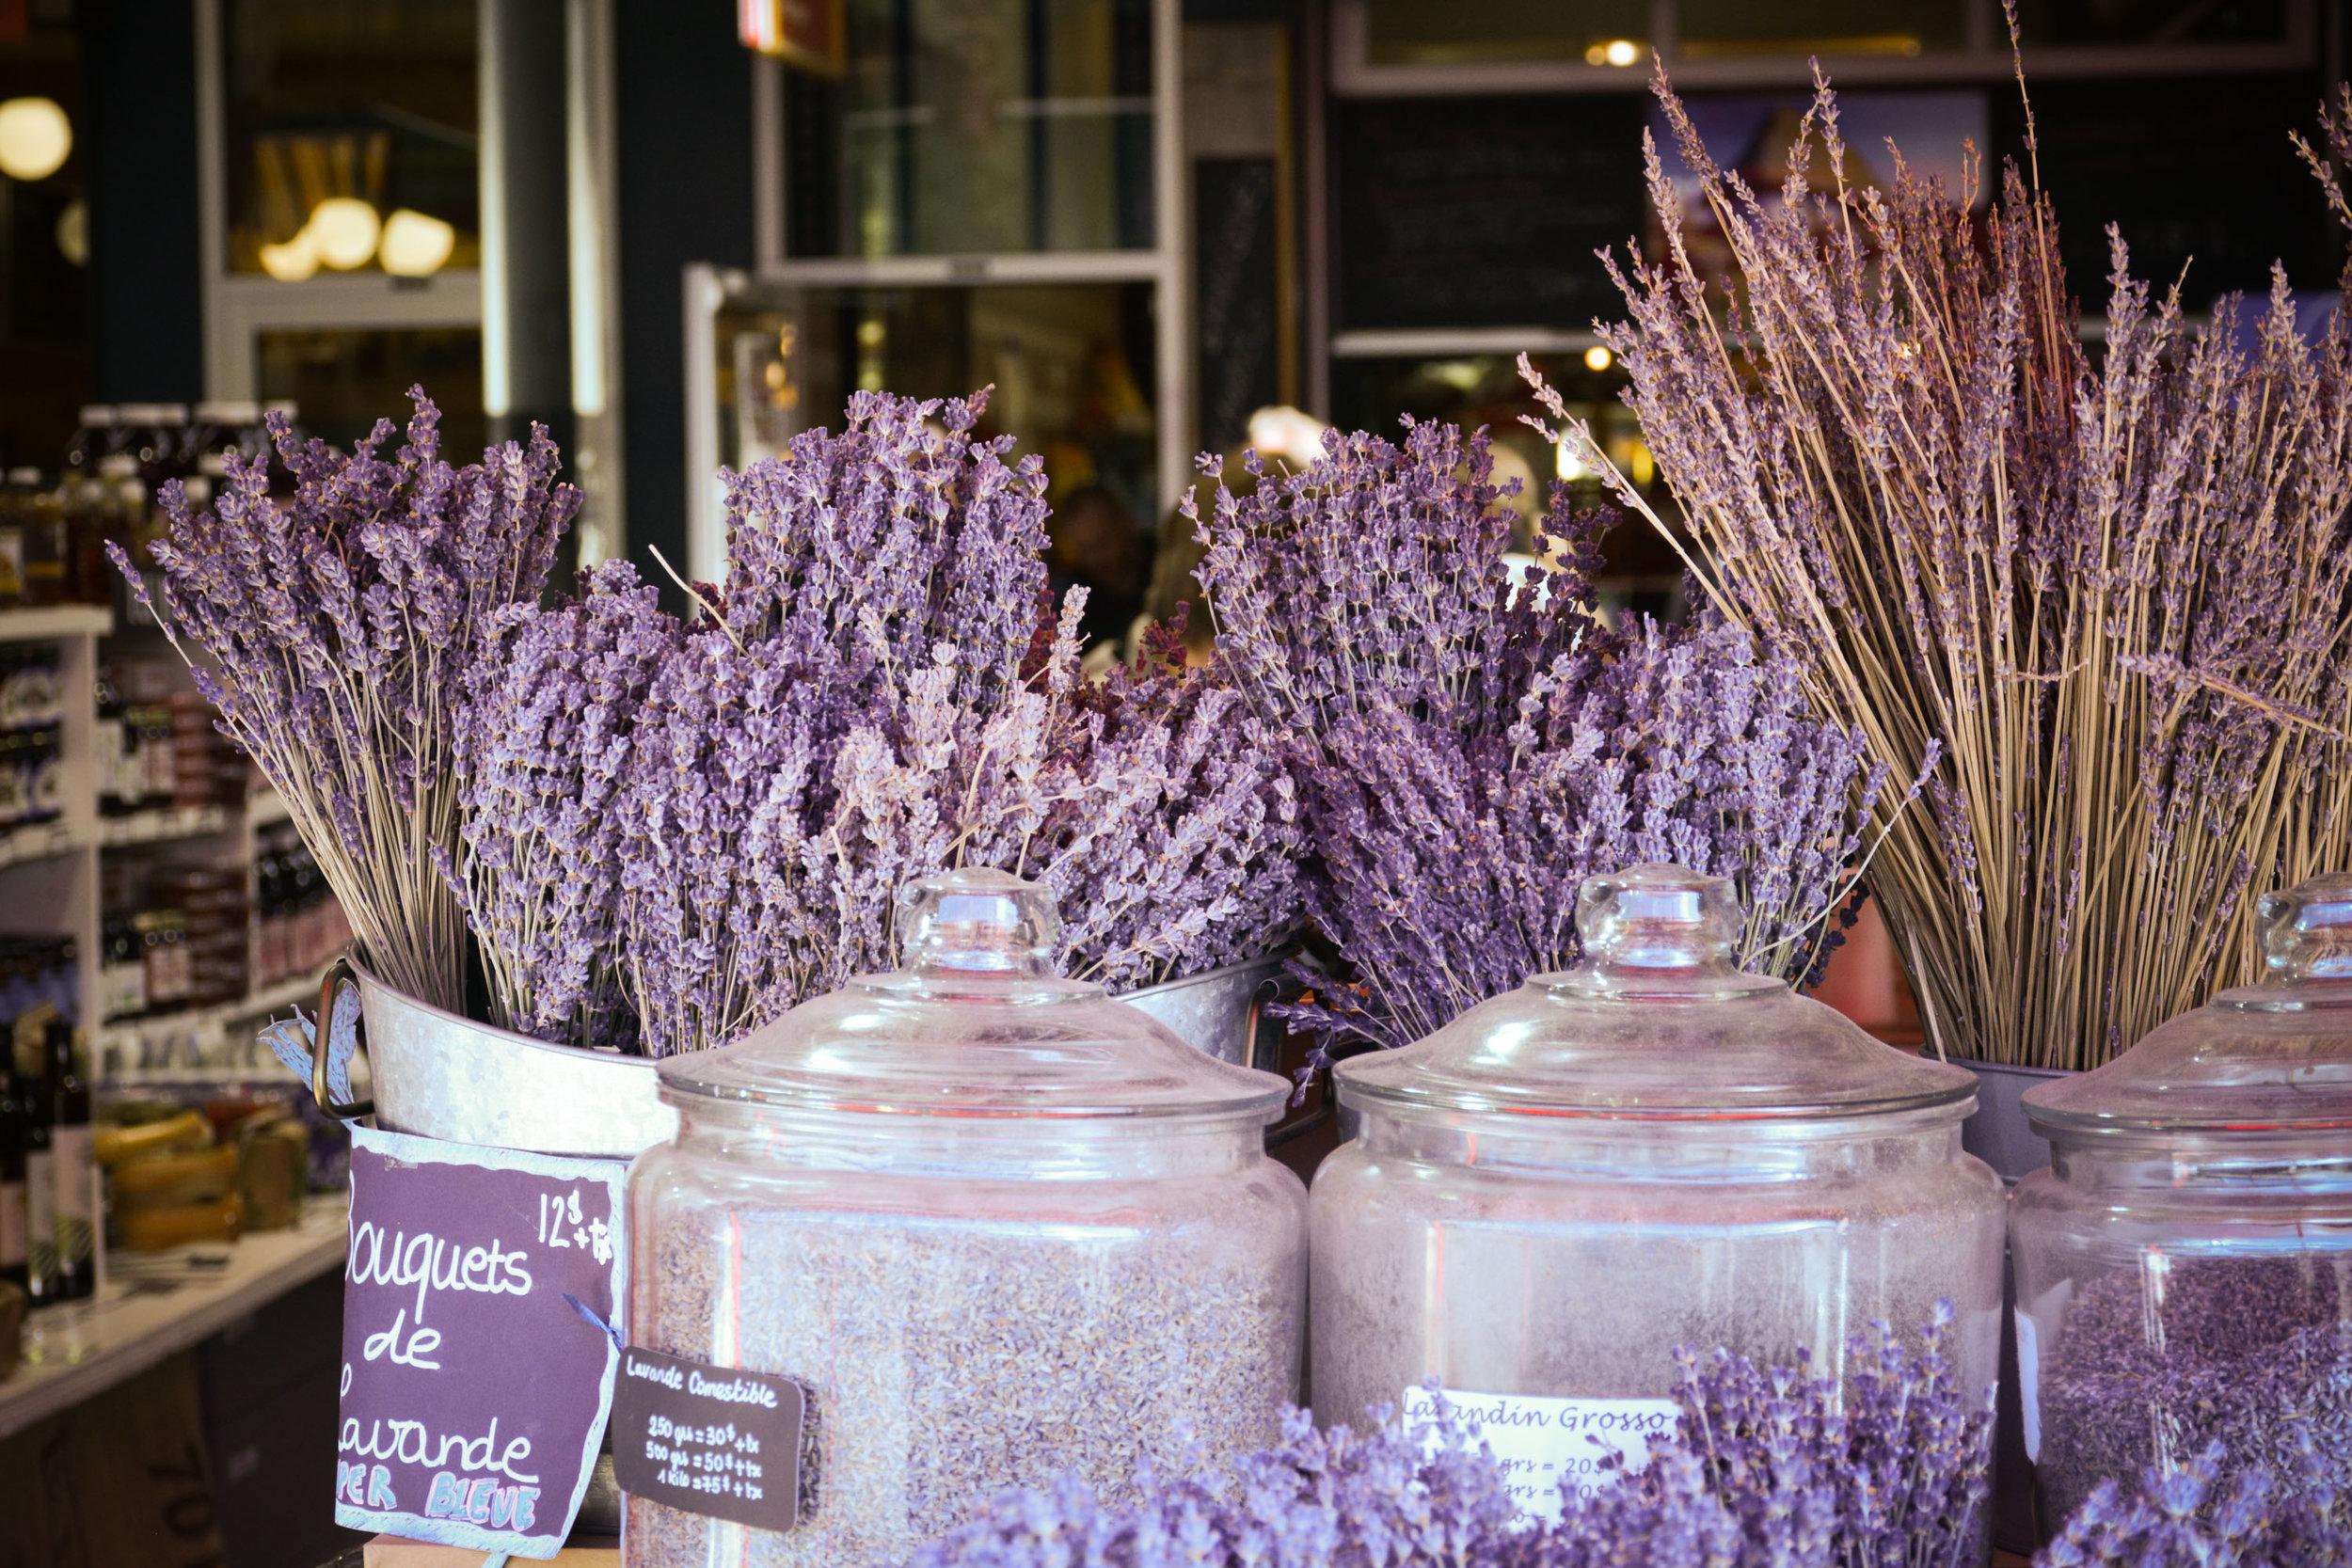 Marché Jean-Talon Montreal Lavender